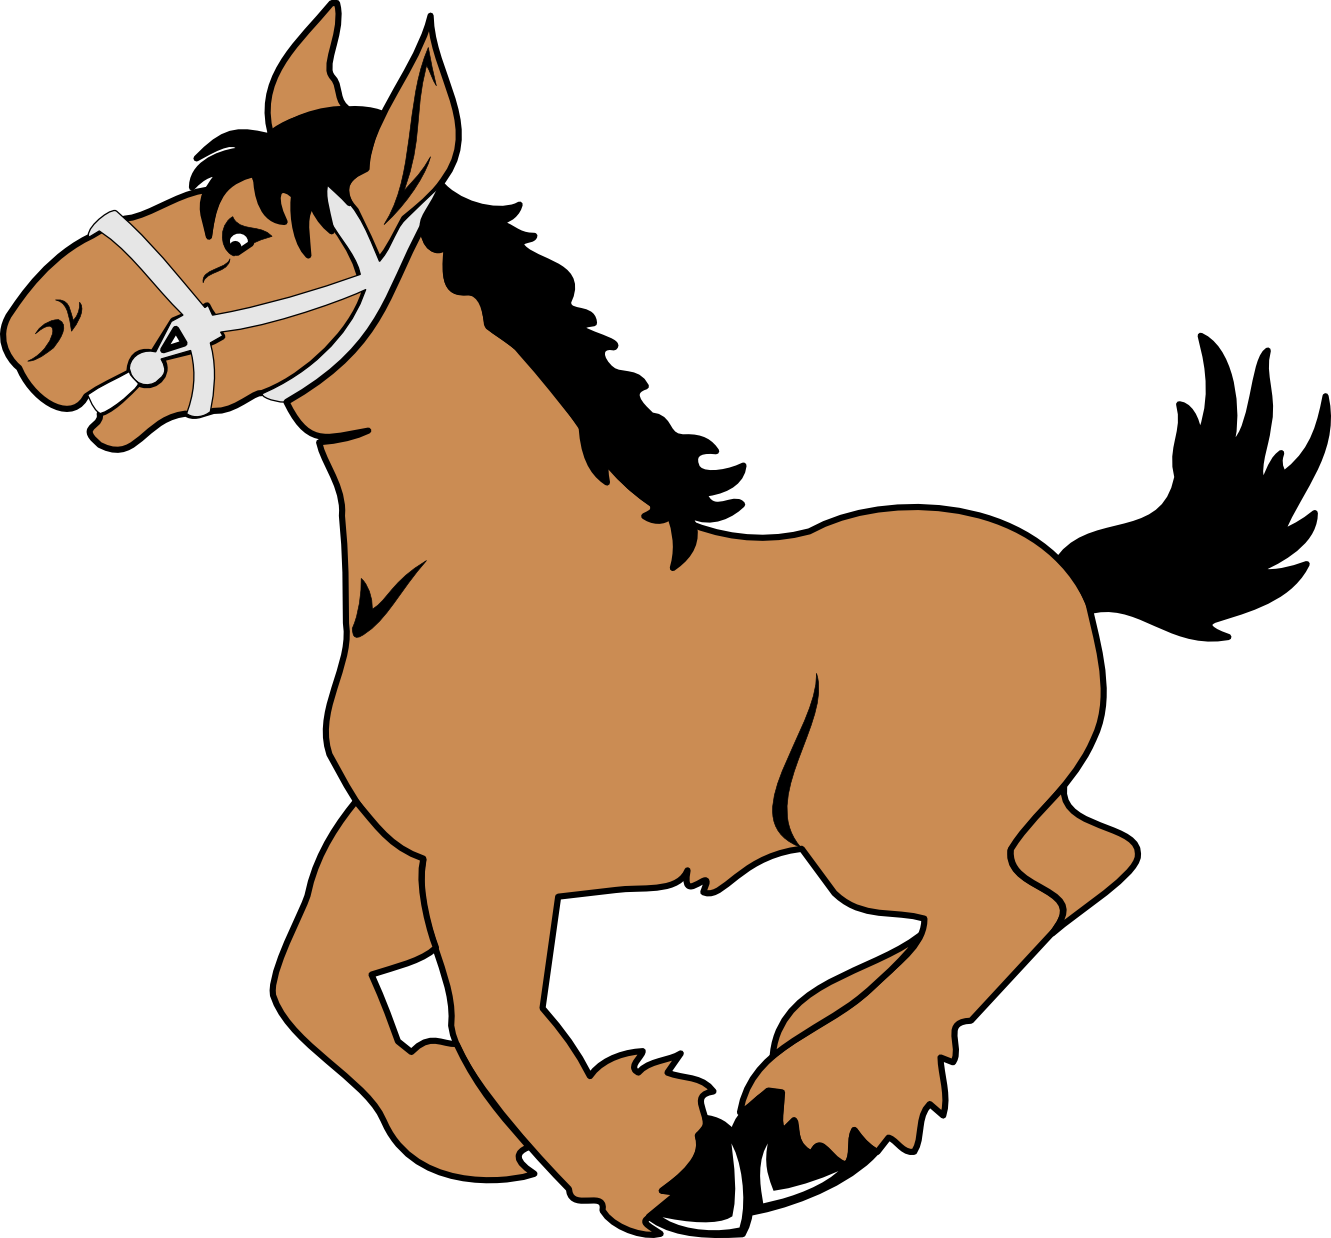 1331x1238 Attractive Free Horse Clipart 27 Silhouette Clip Art Vector